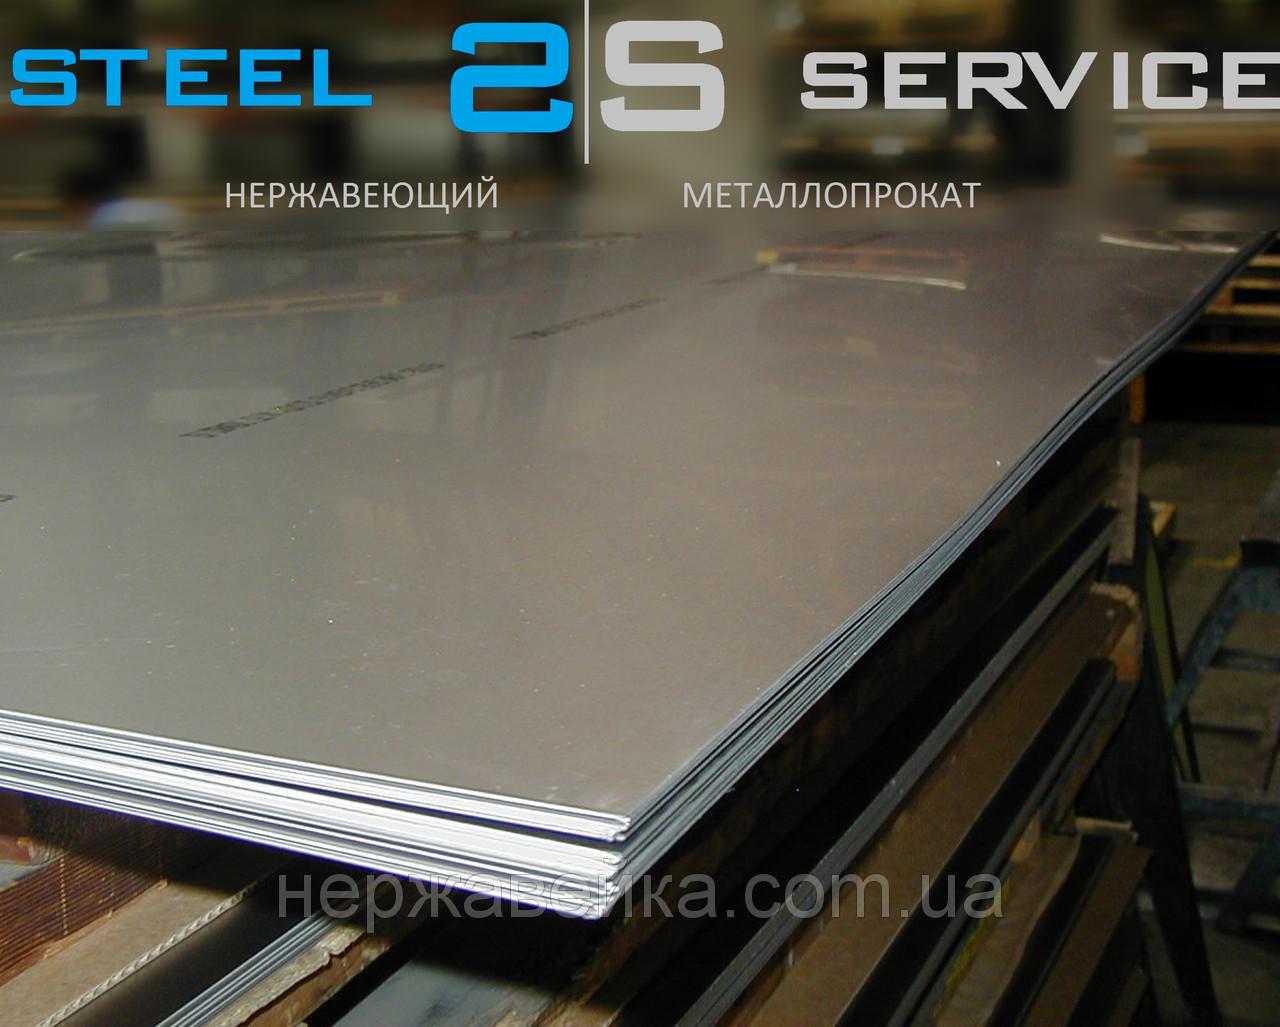 Нержавейка лист 10х1500х3000мм AISI 410S(08Х13) F1 - горячекатанный, технический